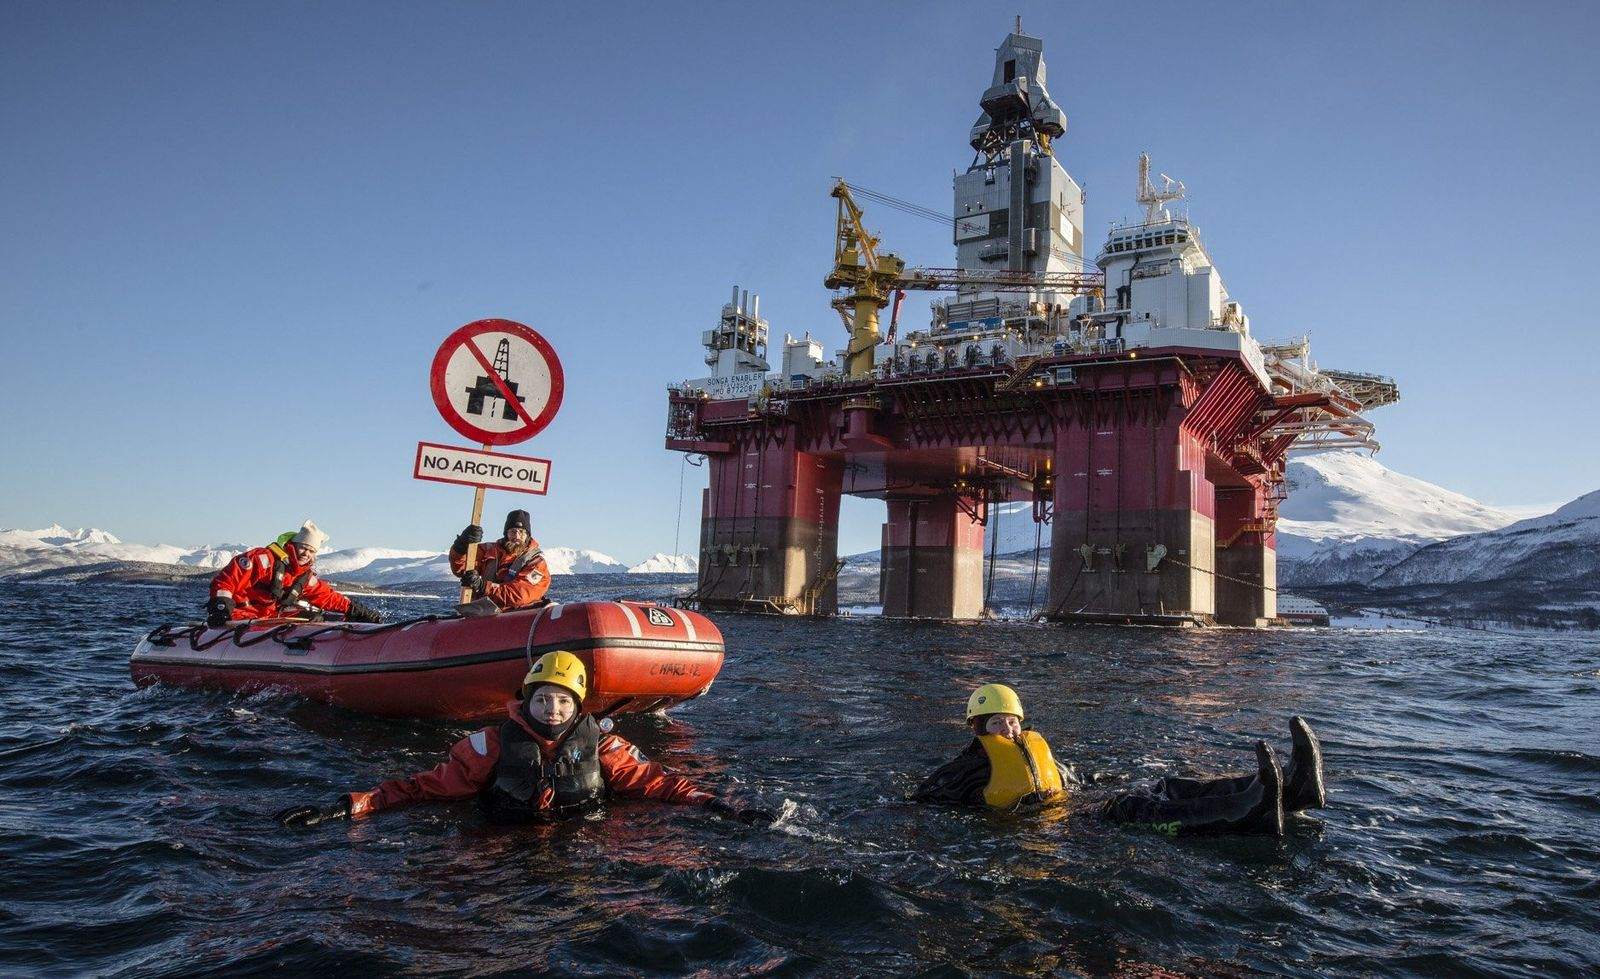 Greenpeace/ gegen Bohrungen in der Arktis